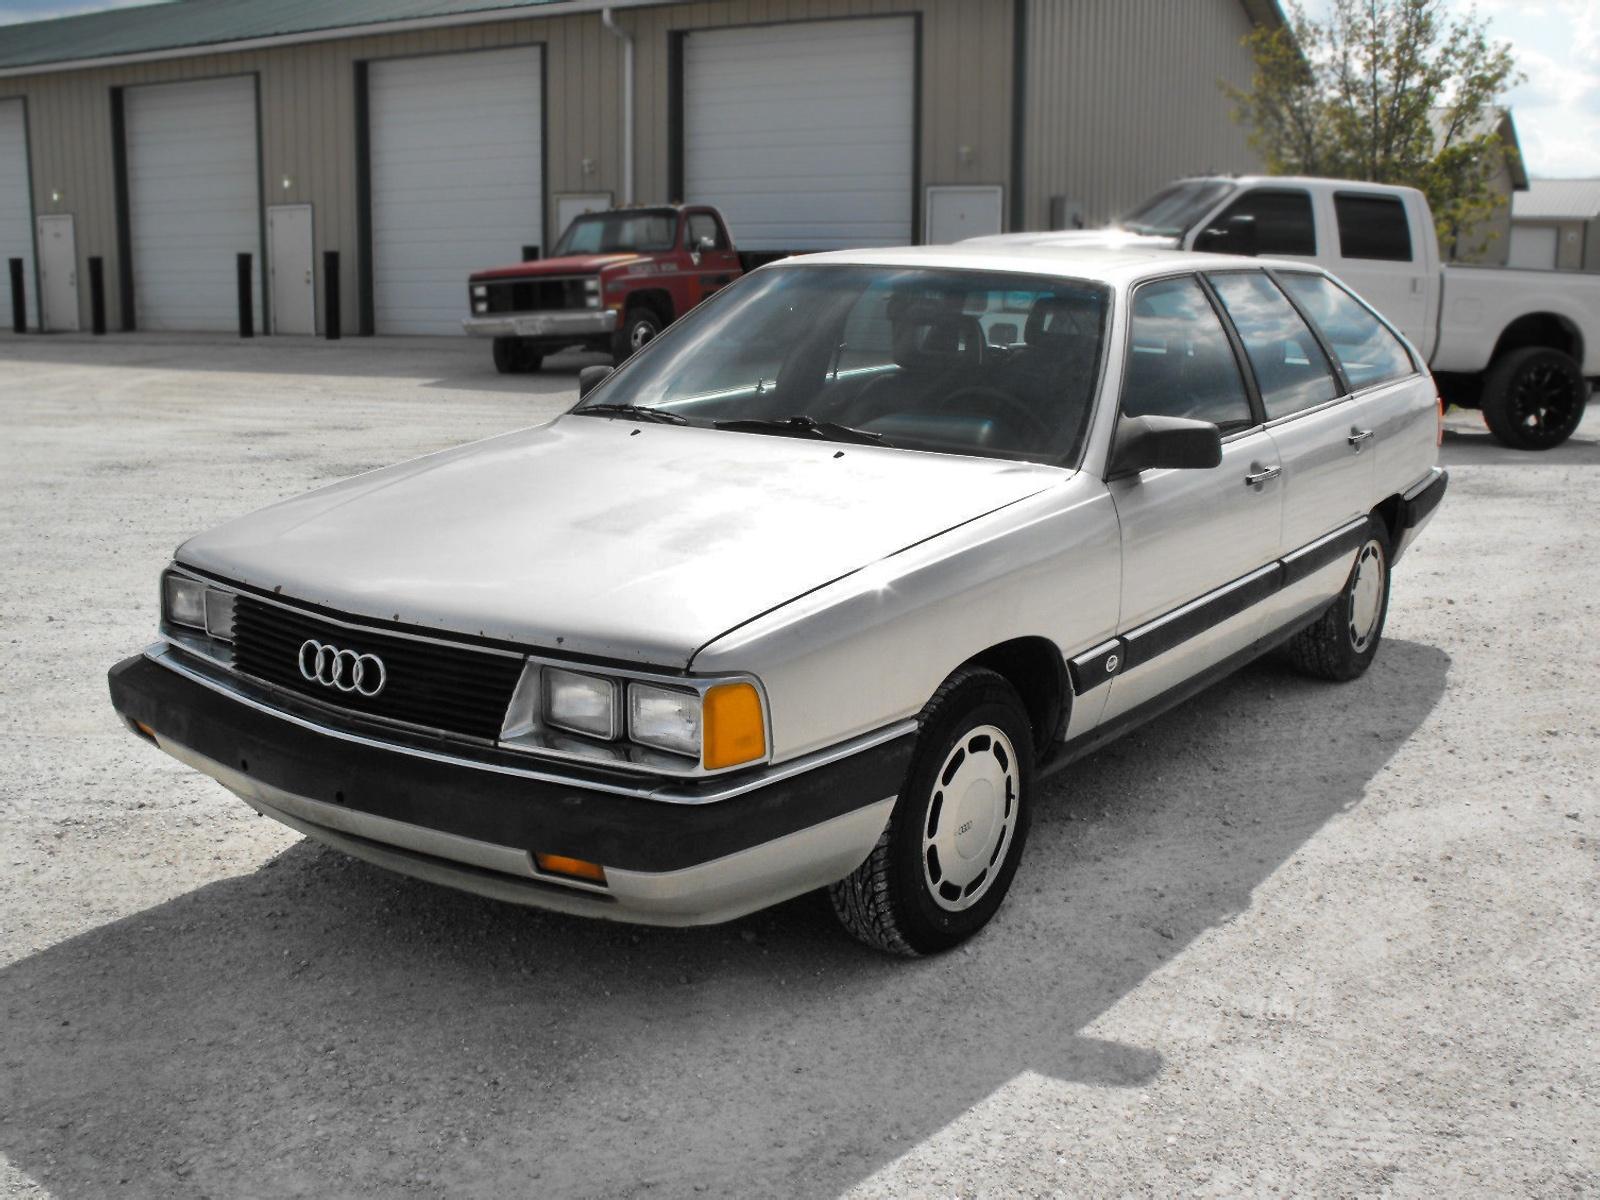 5 Speed Wagon 1985 Audi 5000 S